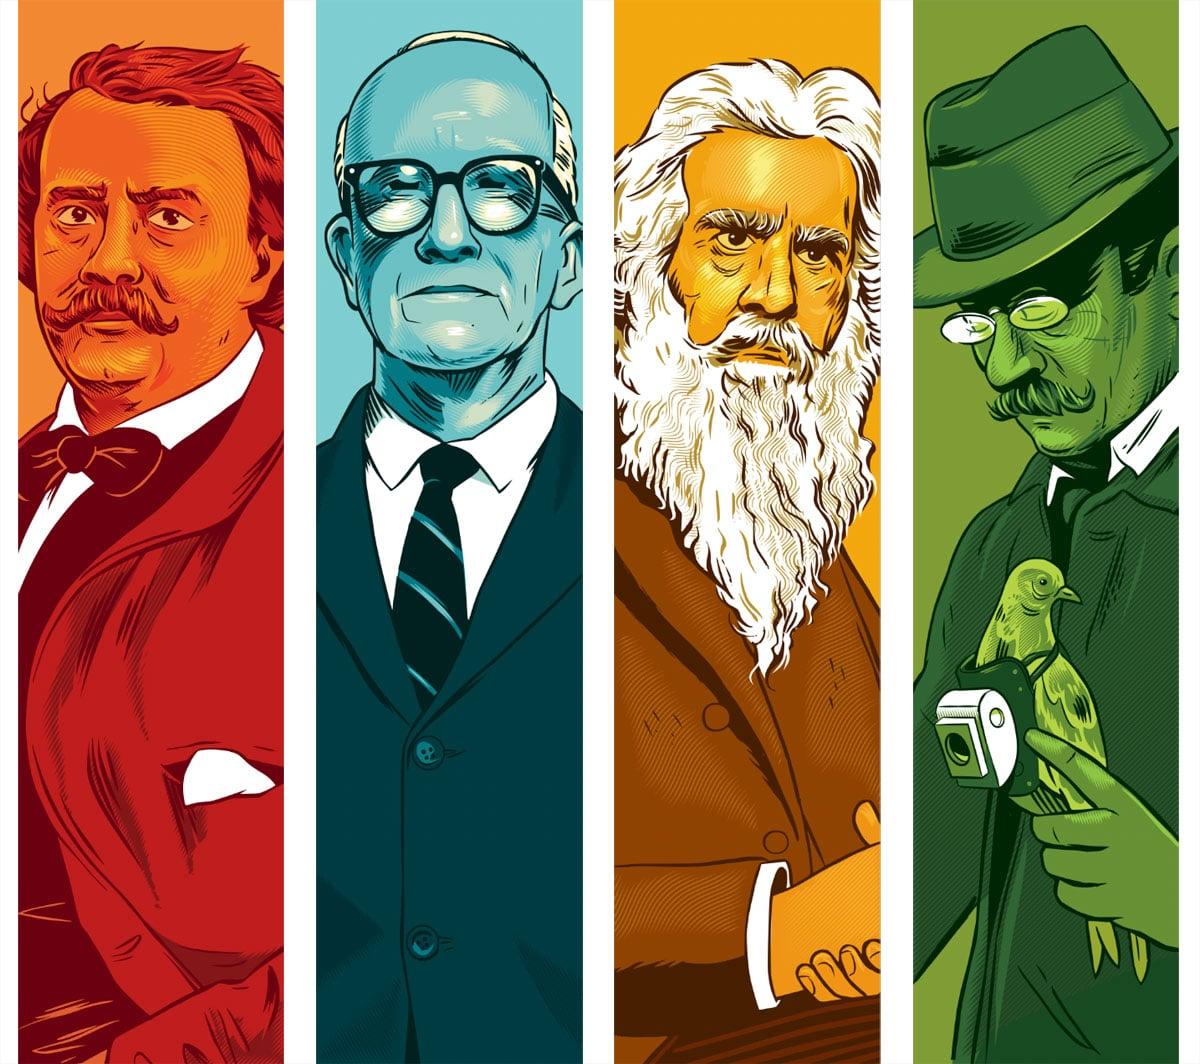 Nadar, Bucky, Muybridge, and Neubronner